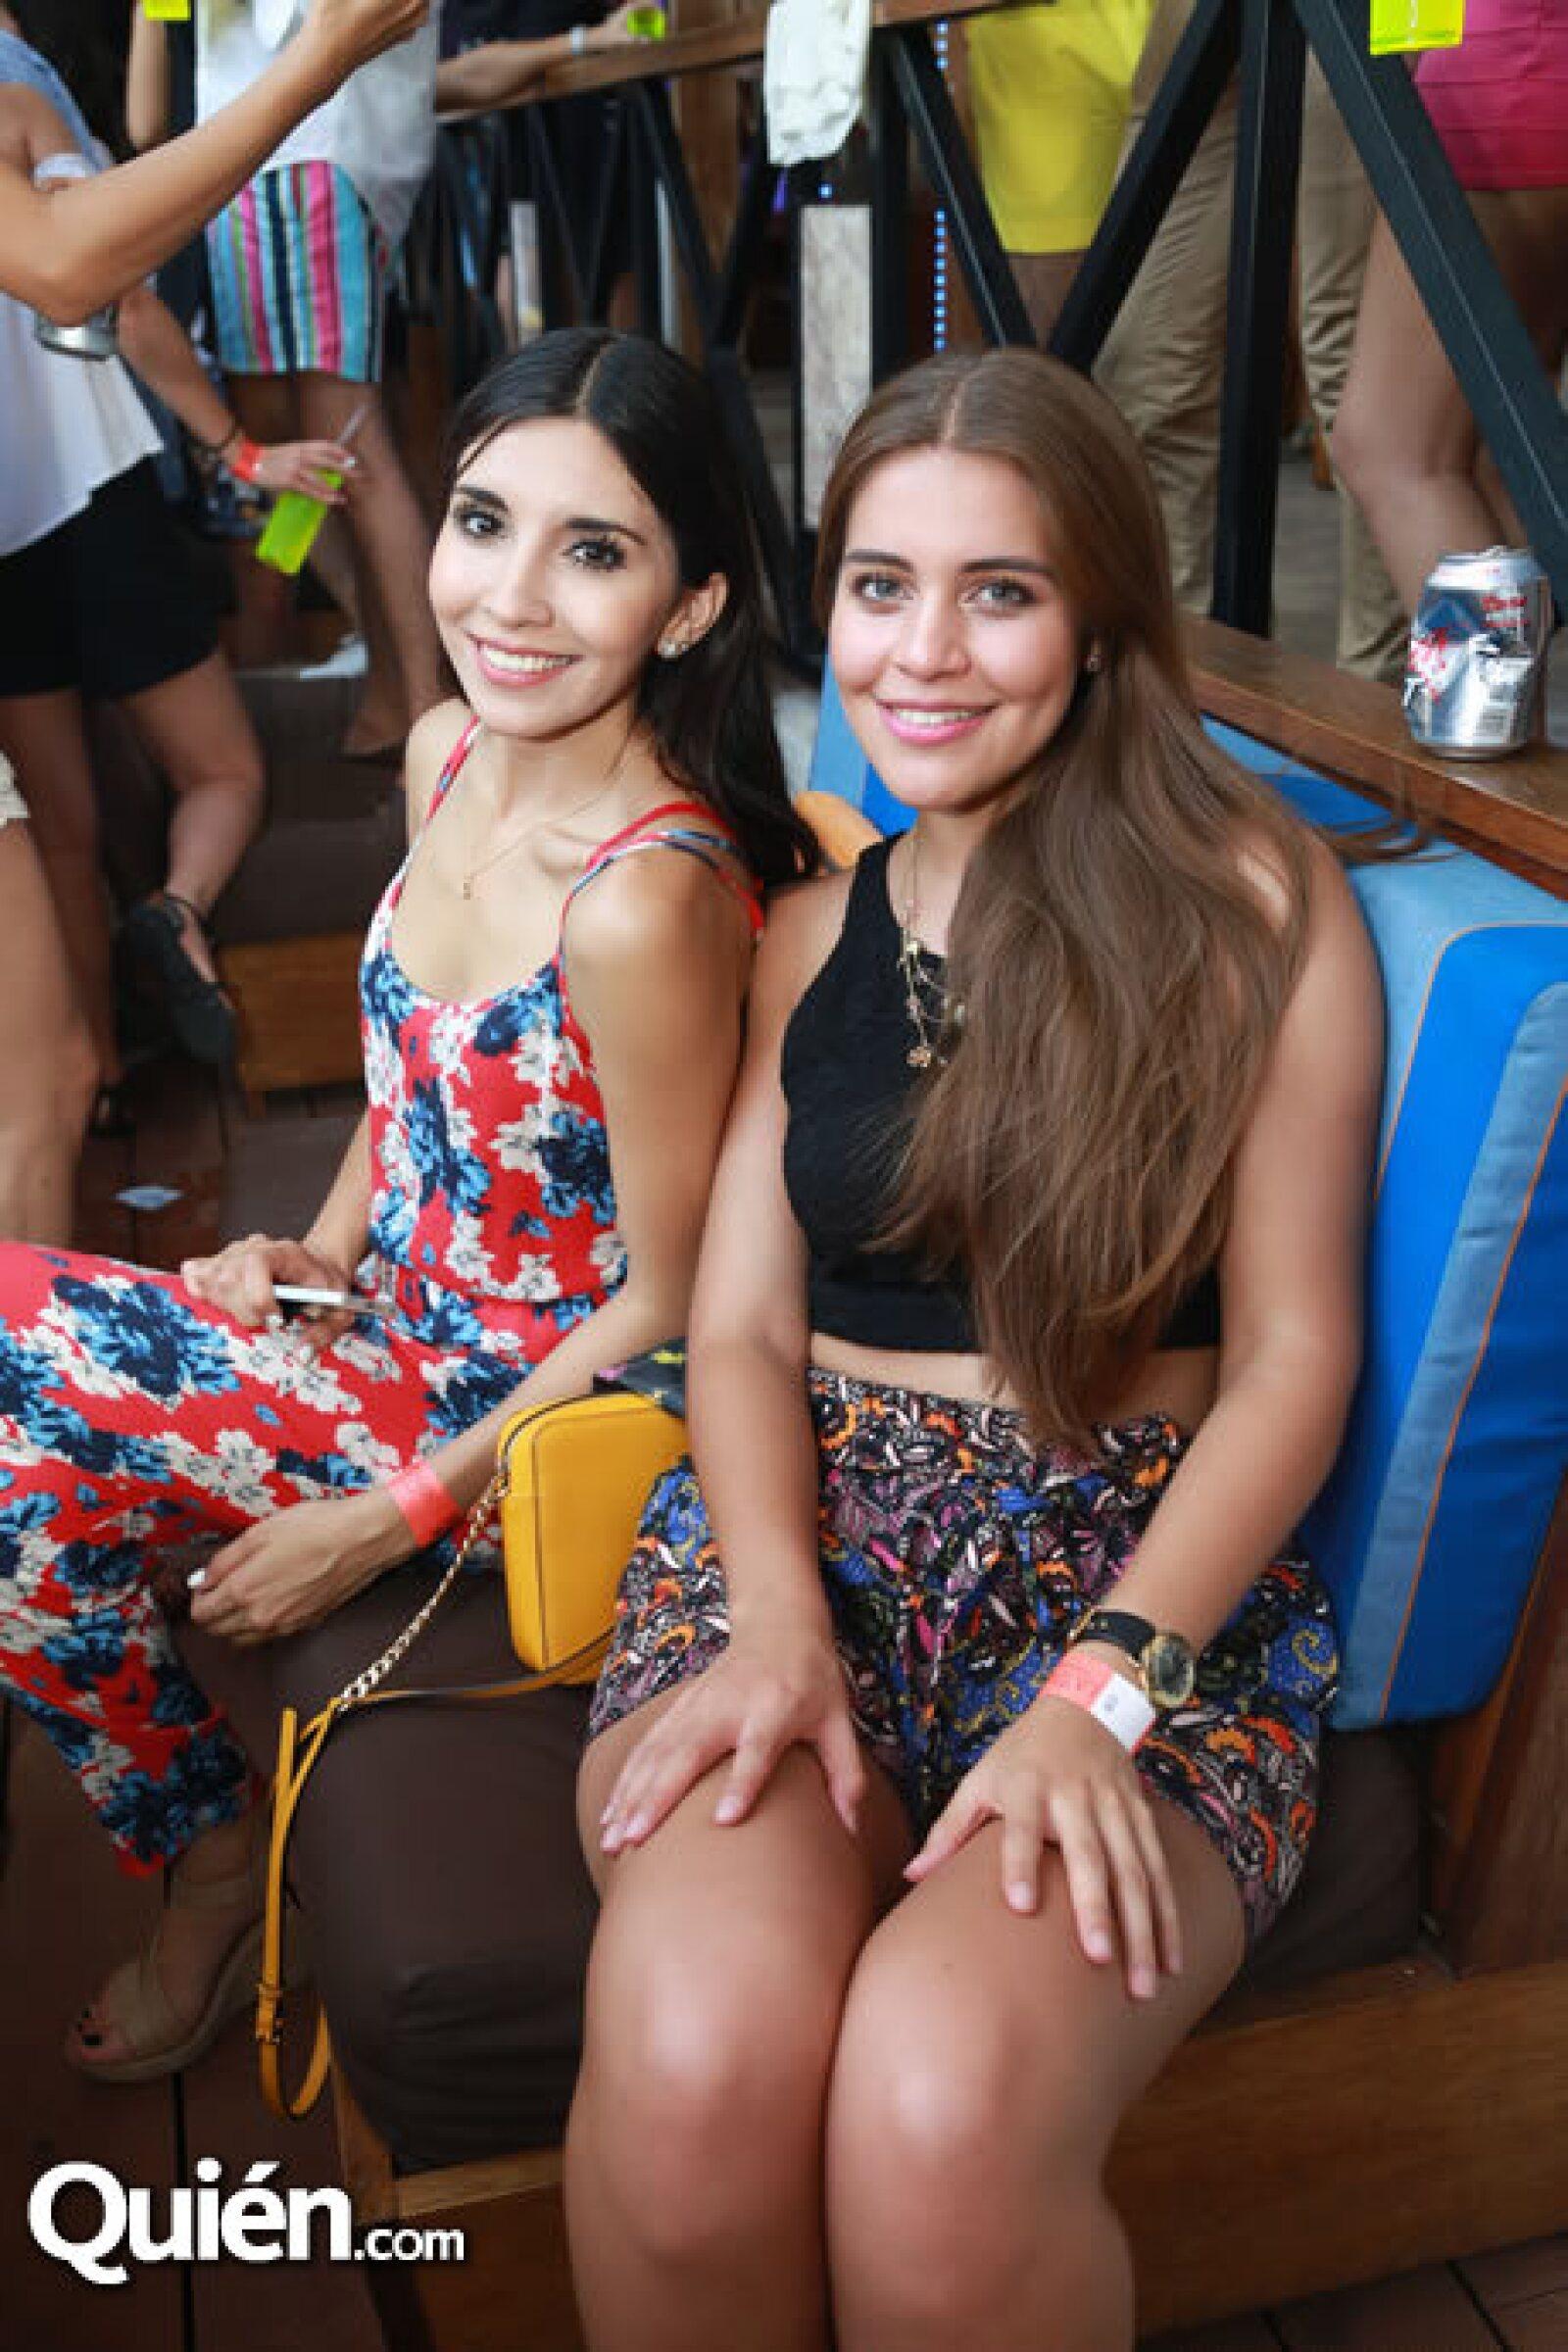 Yesenia de la Torre y Natalia Villalvaso